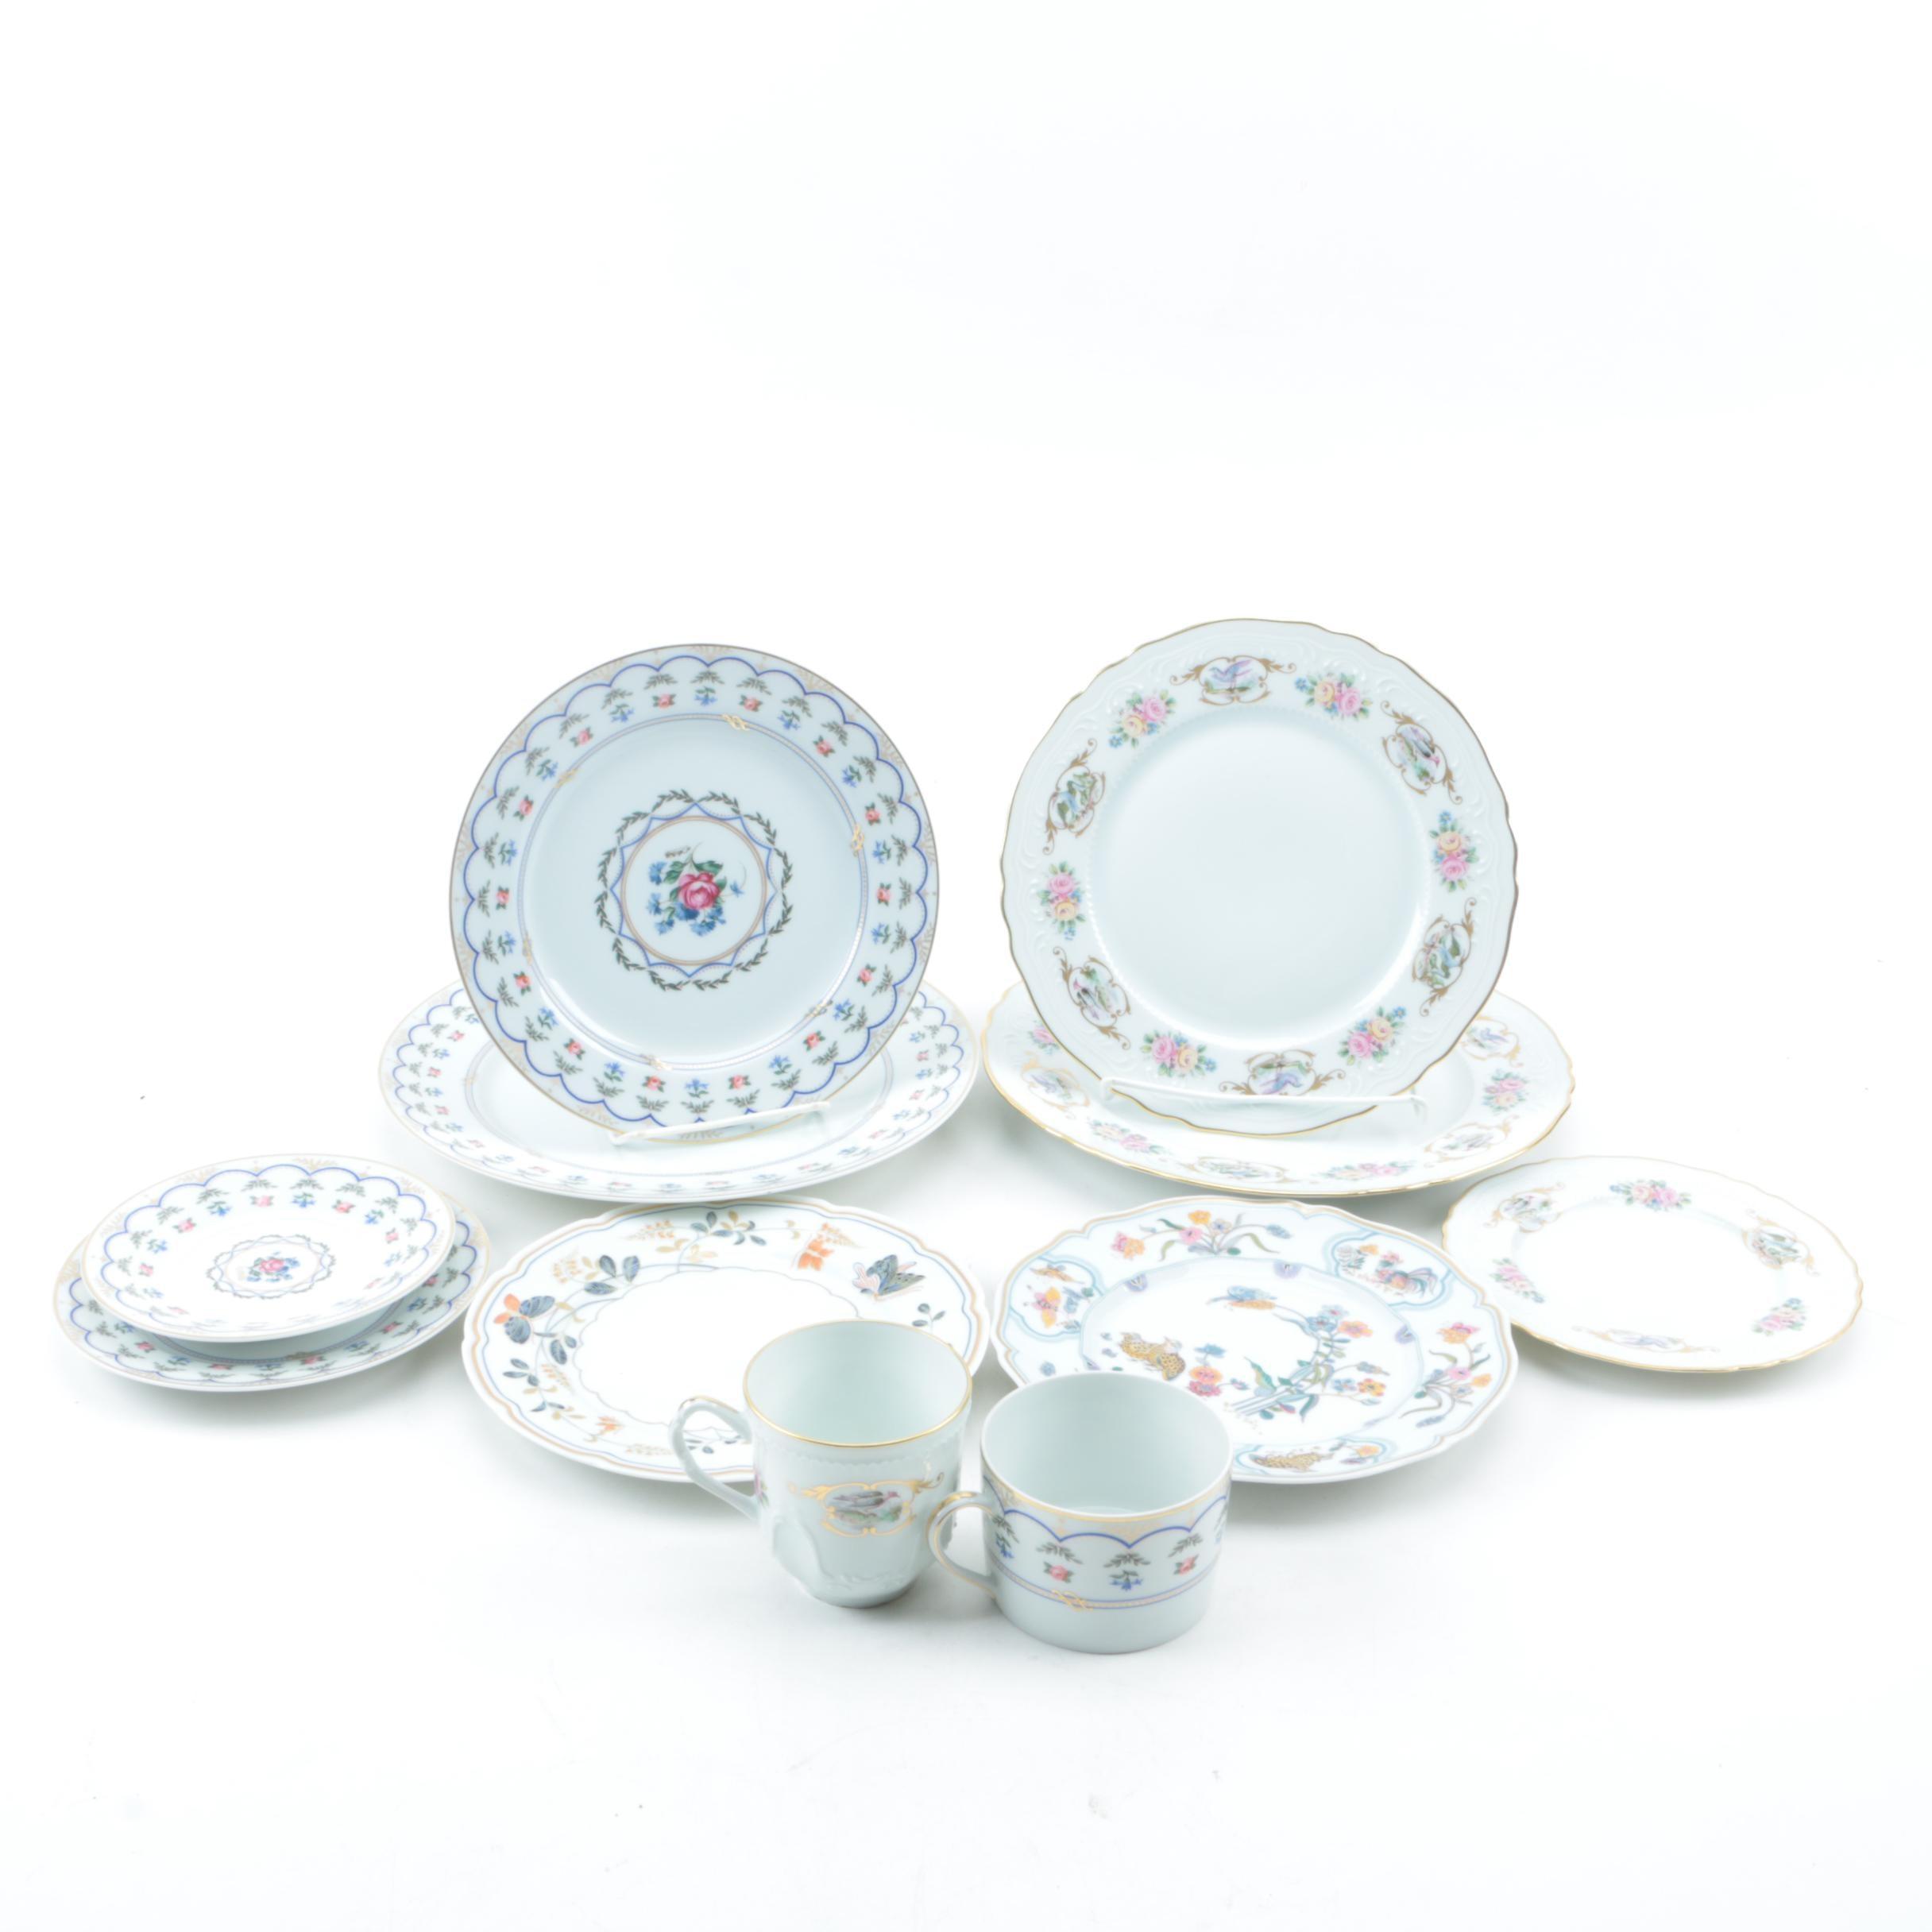 Ancienne Manufacture Royal Limoges Porcelain Tableware